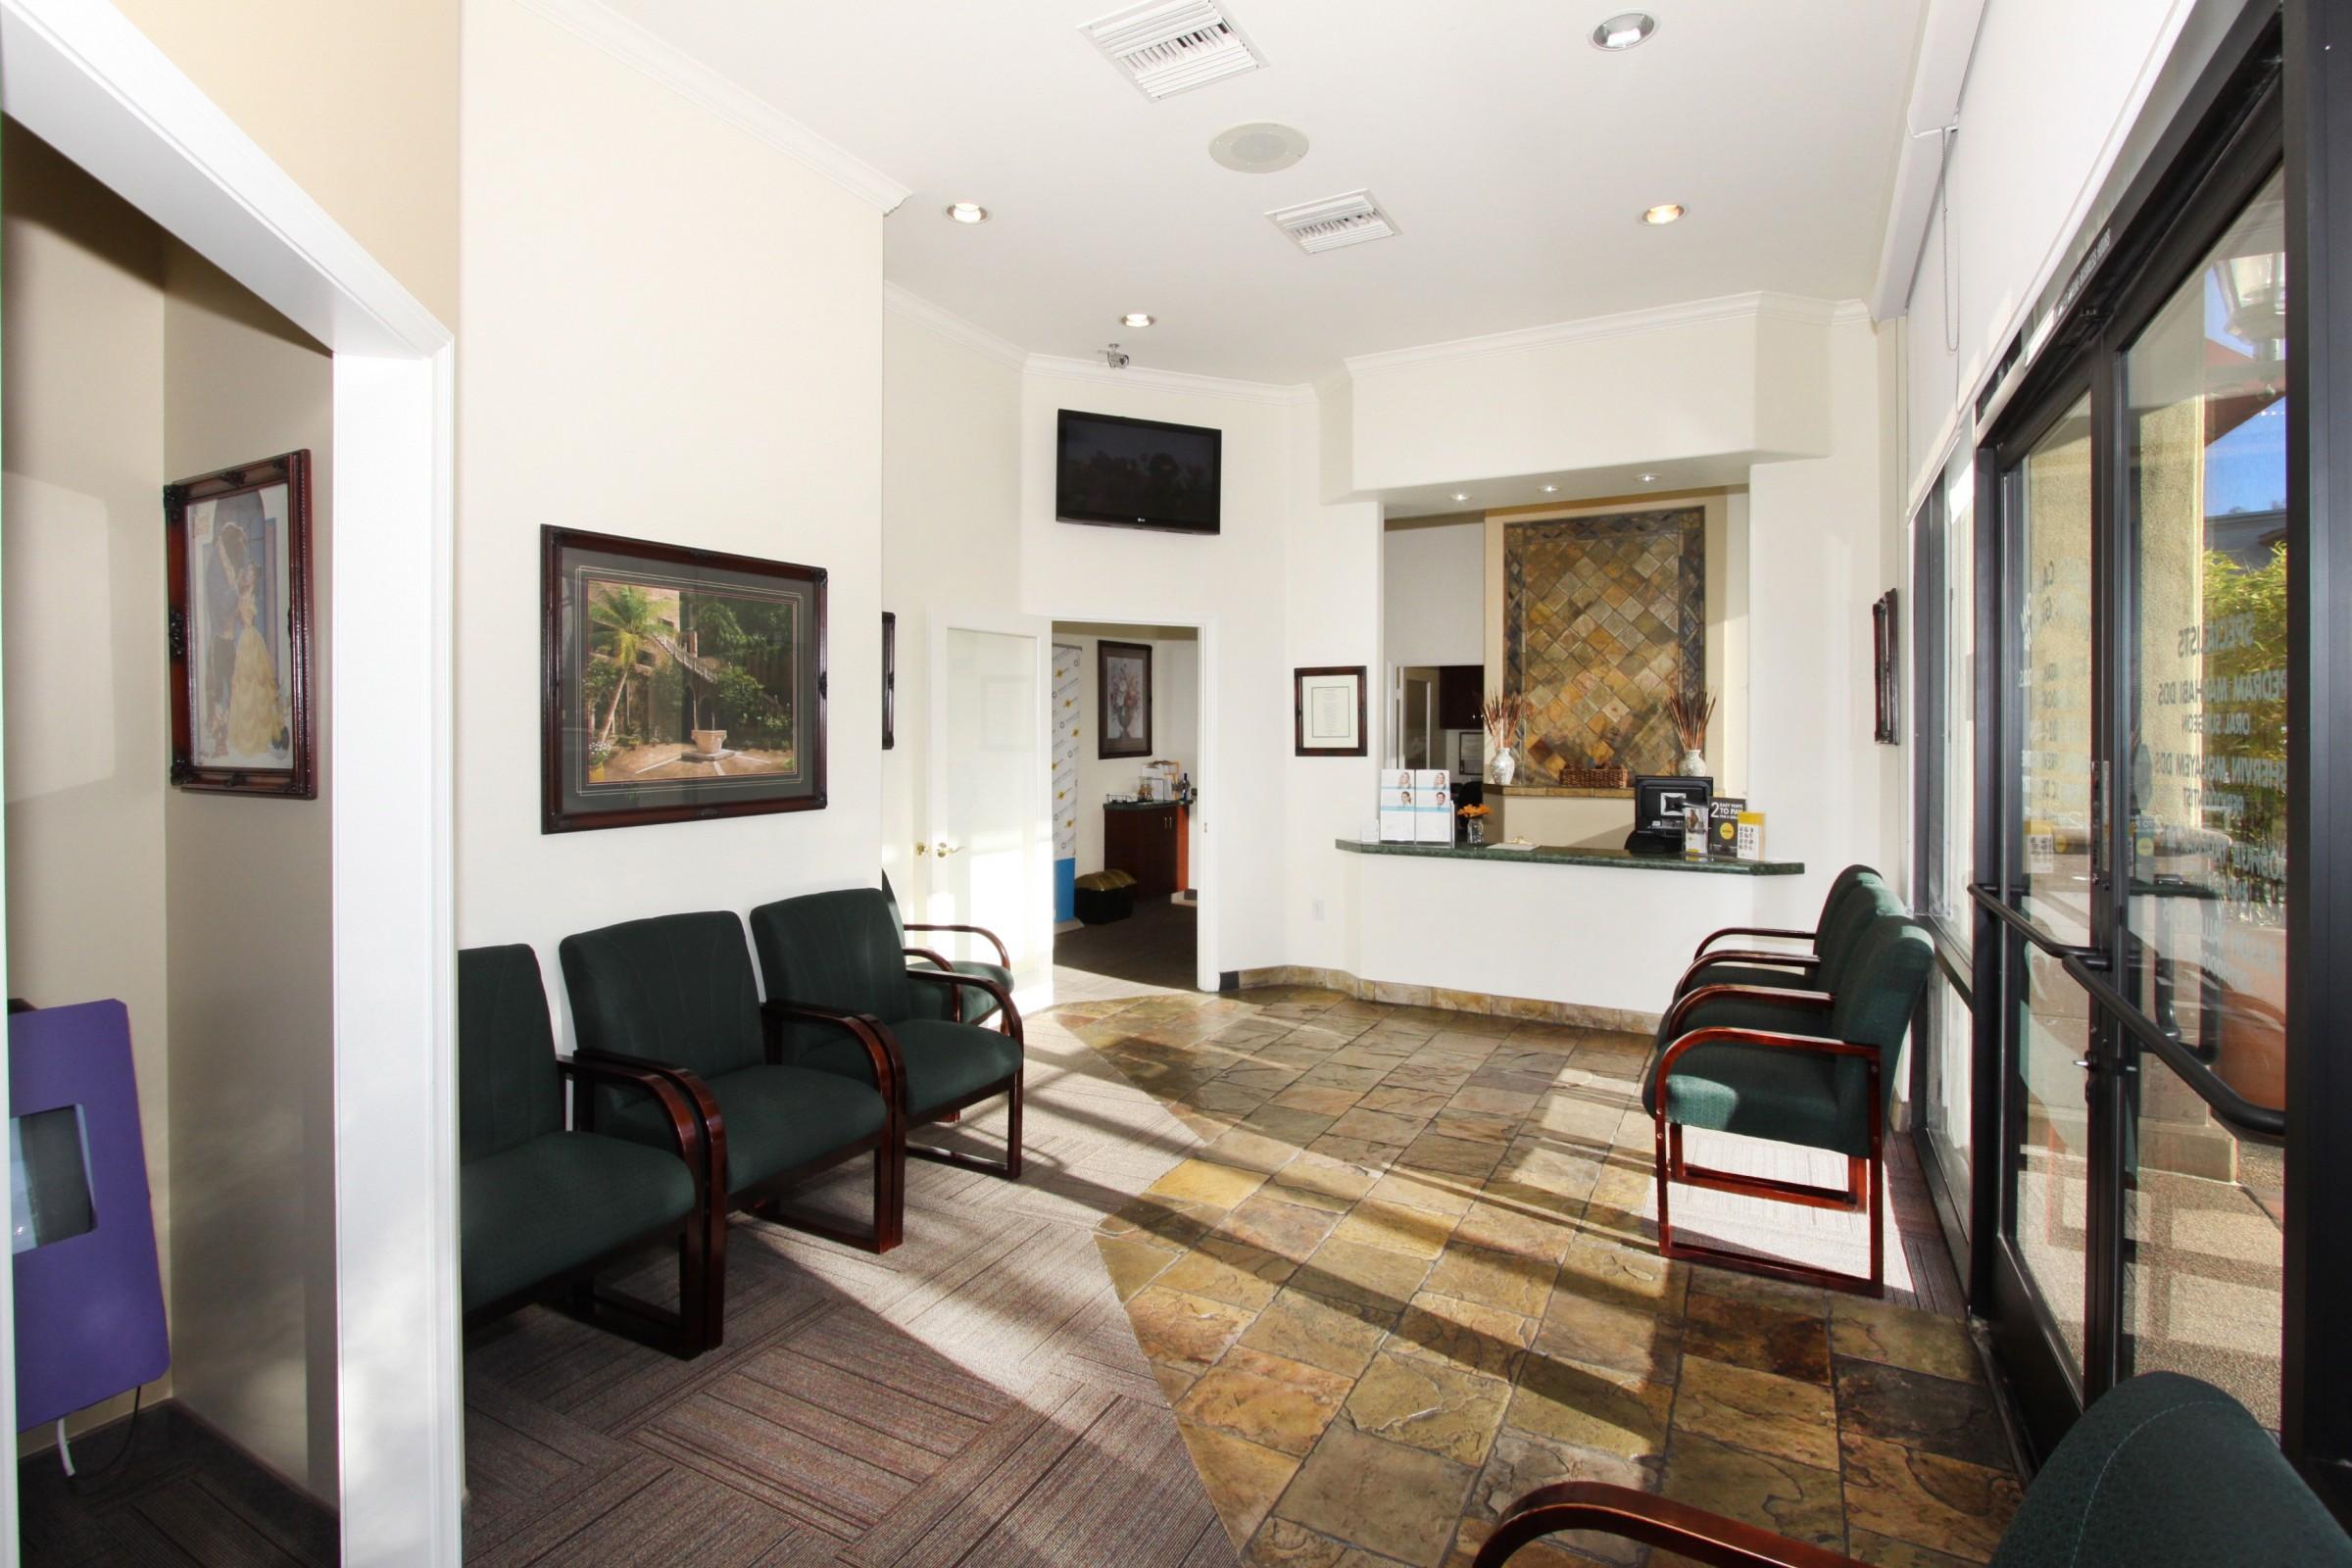 Hasley Canyon Dental Group and Orthodontics image 1